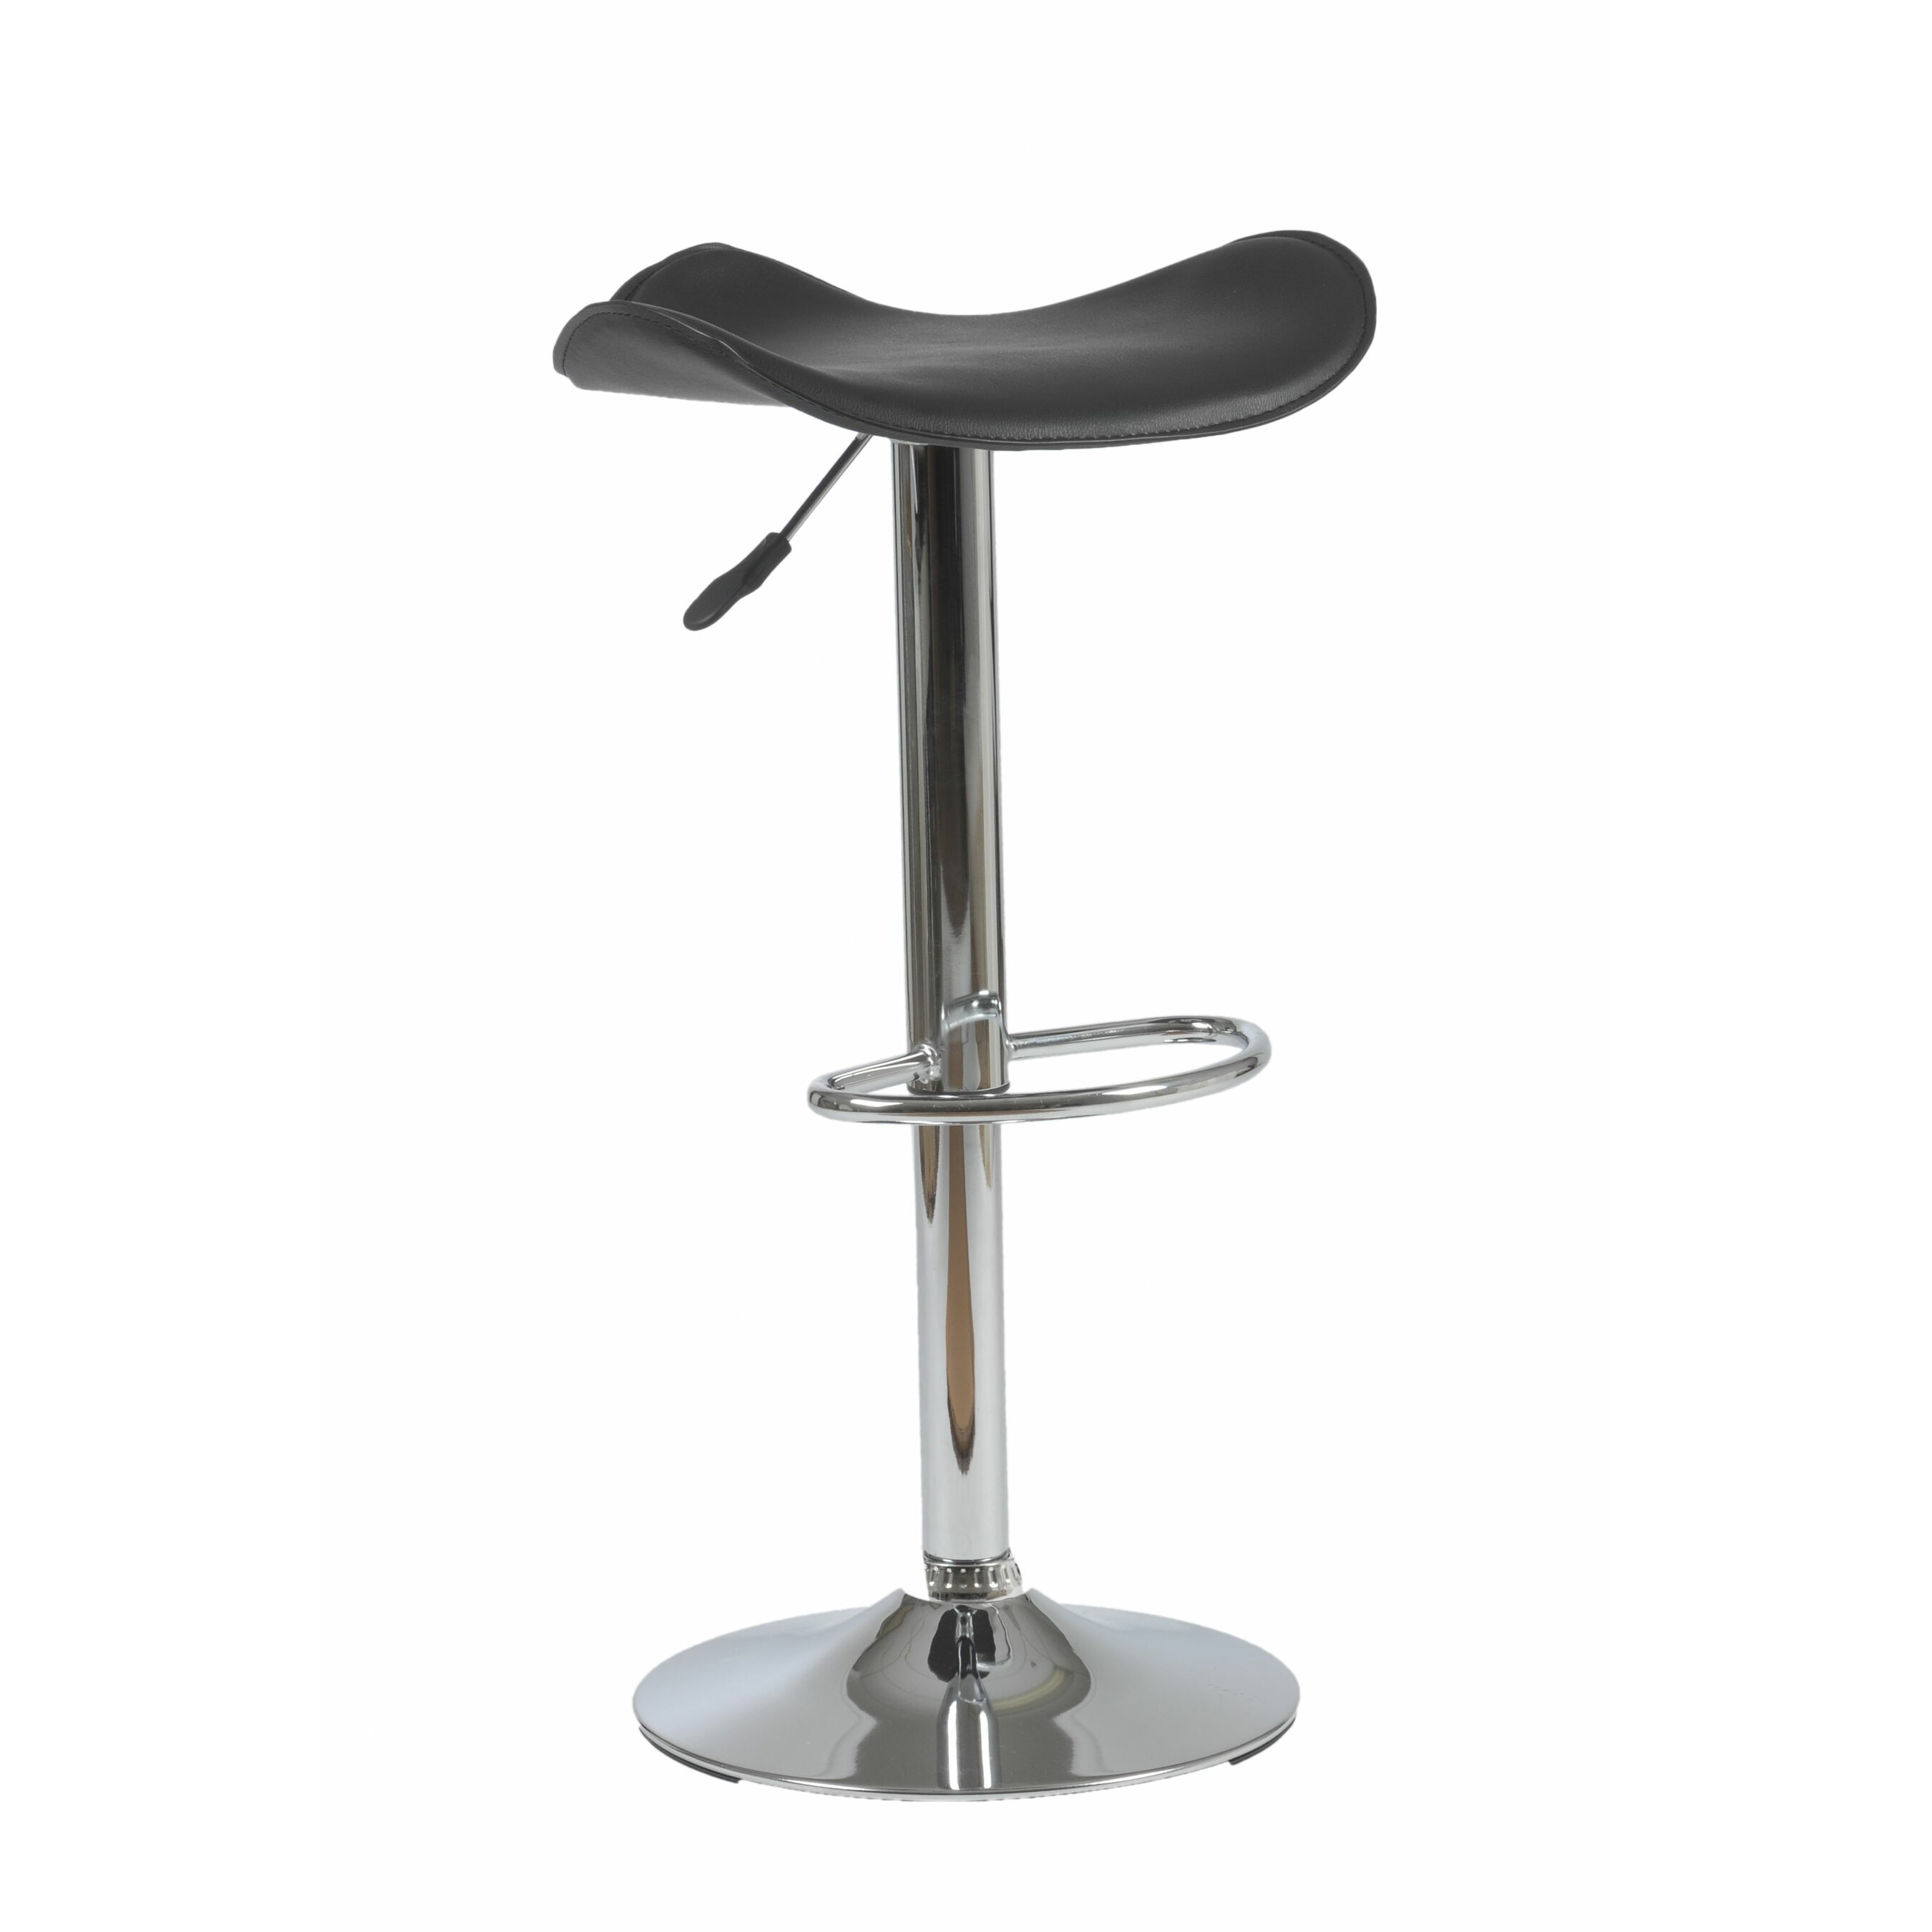 Eurostyle fabia adjustable height swivel bar stool for Adjustable height bar stools